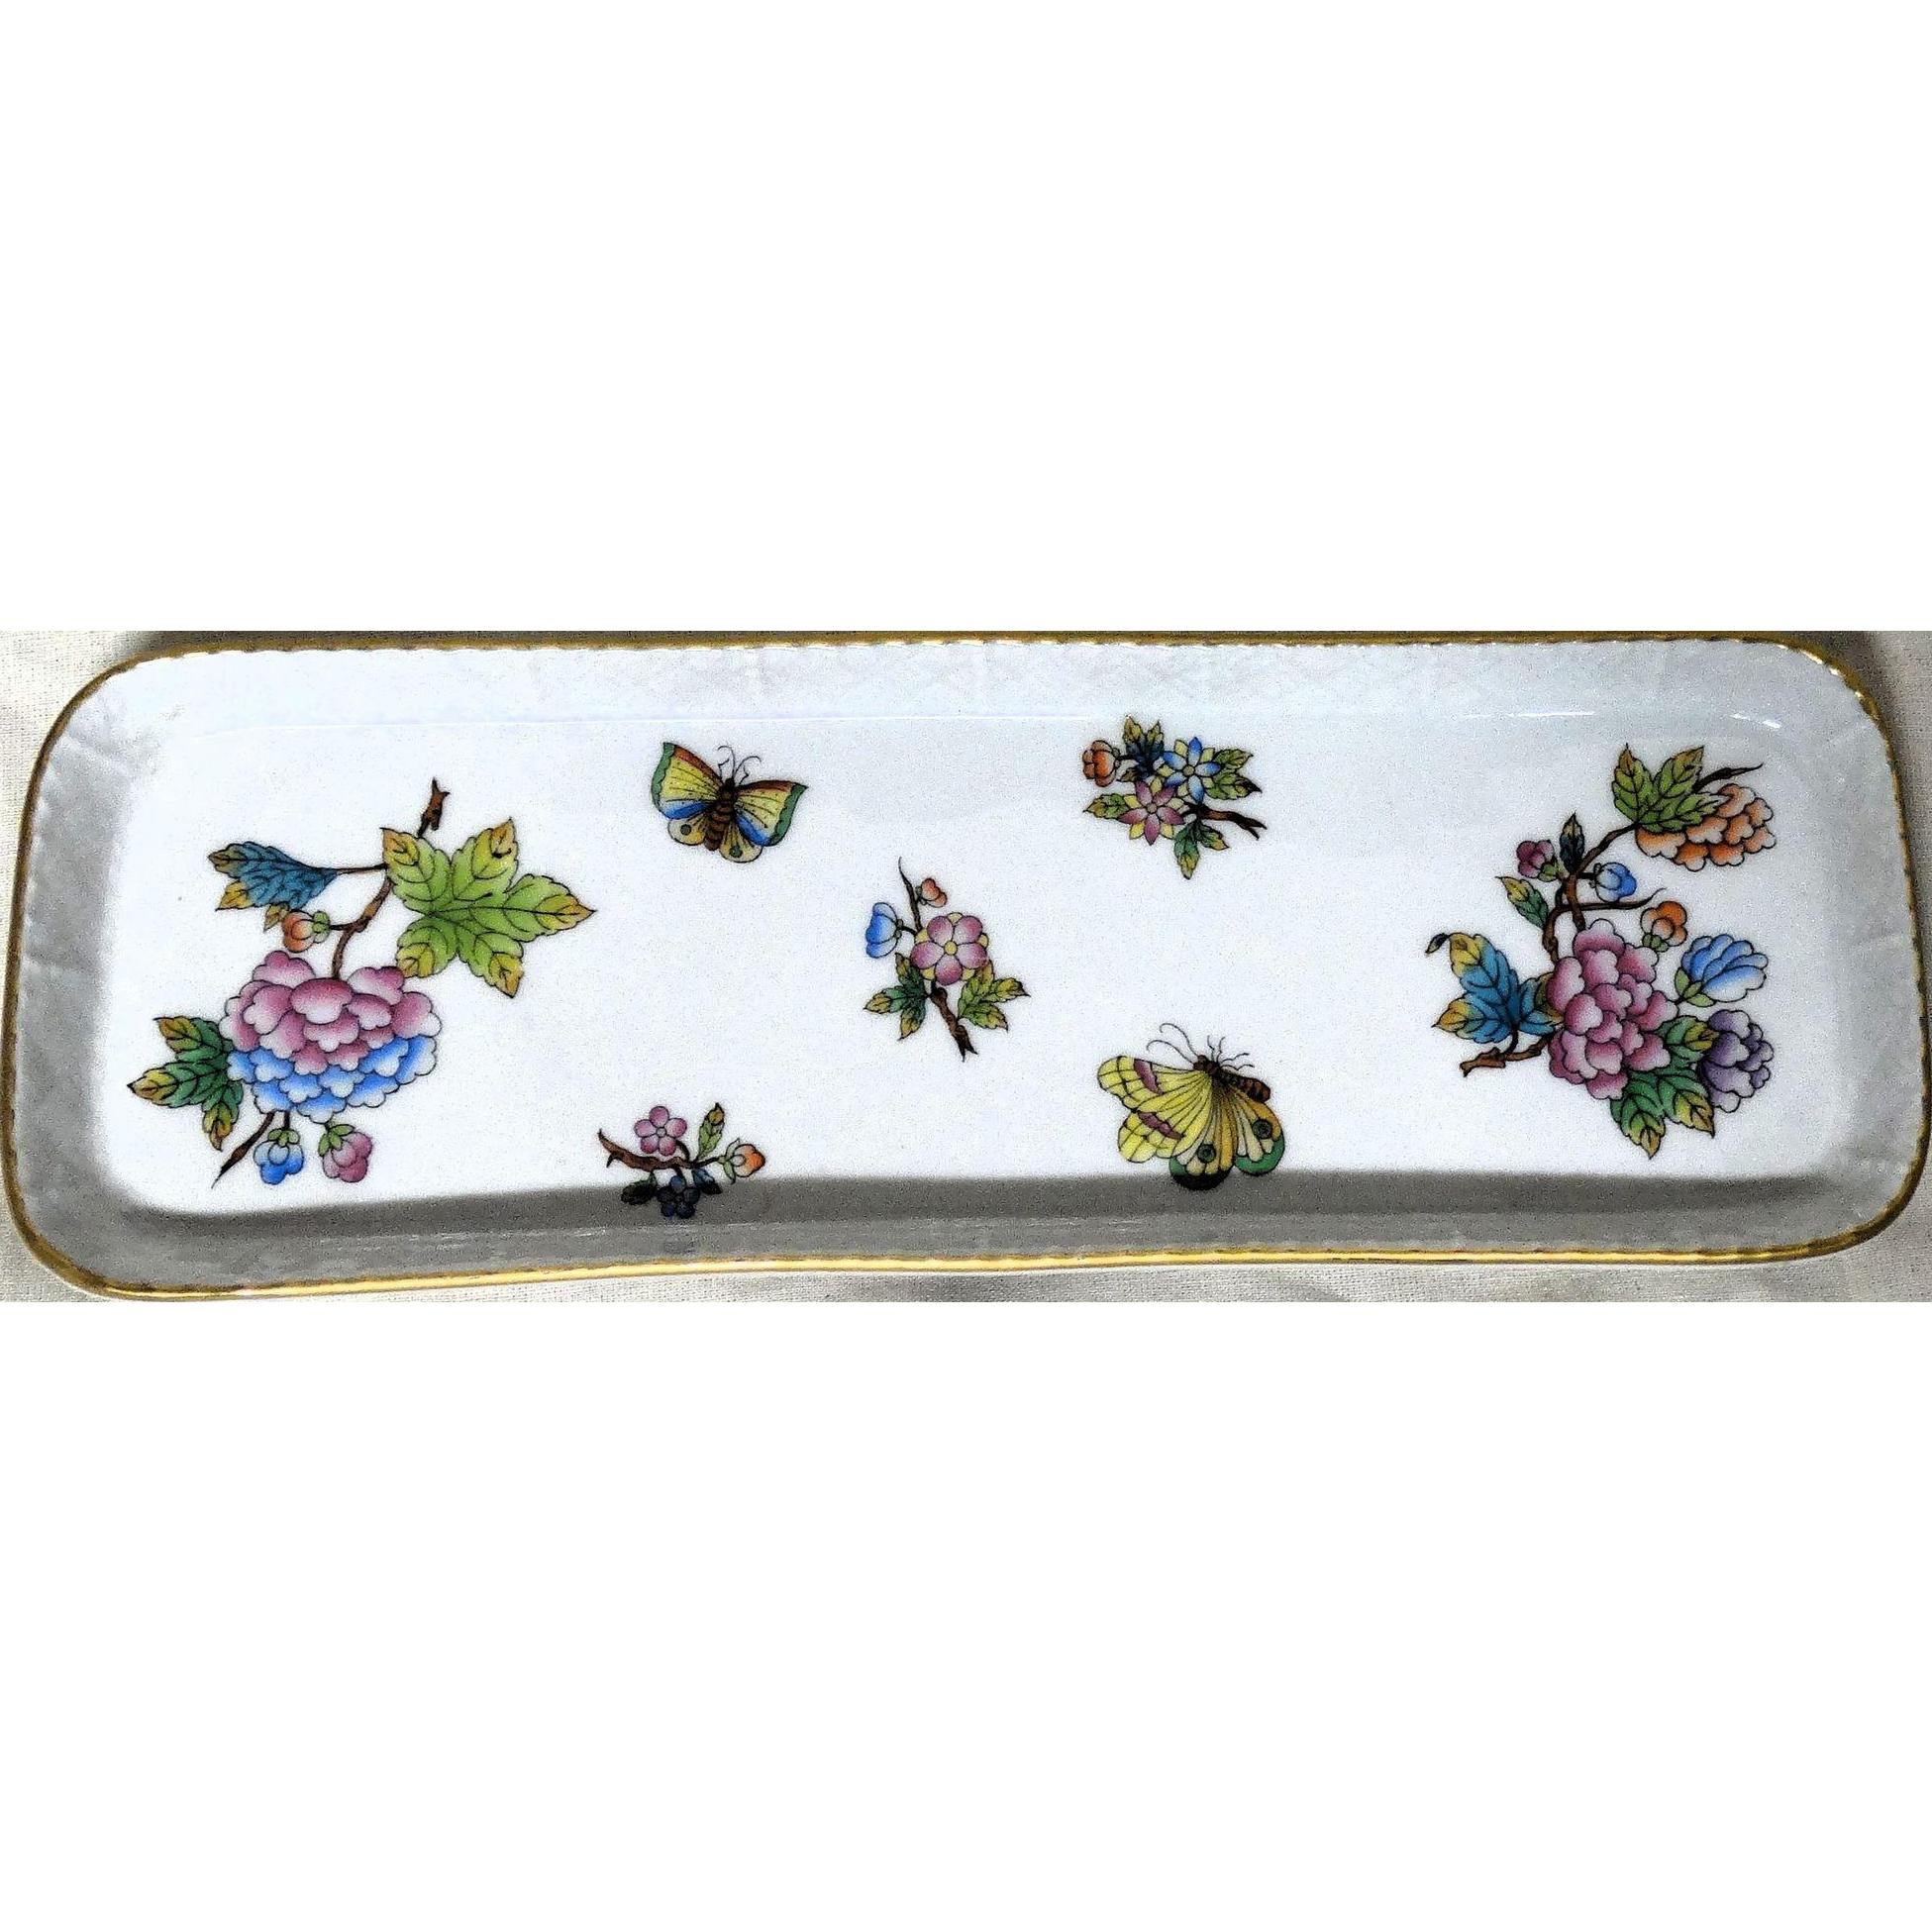 HEREND Porcelain Queen Victorian Pattern Dresser Tray